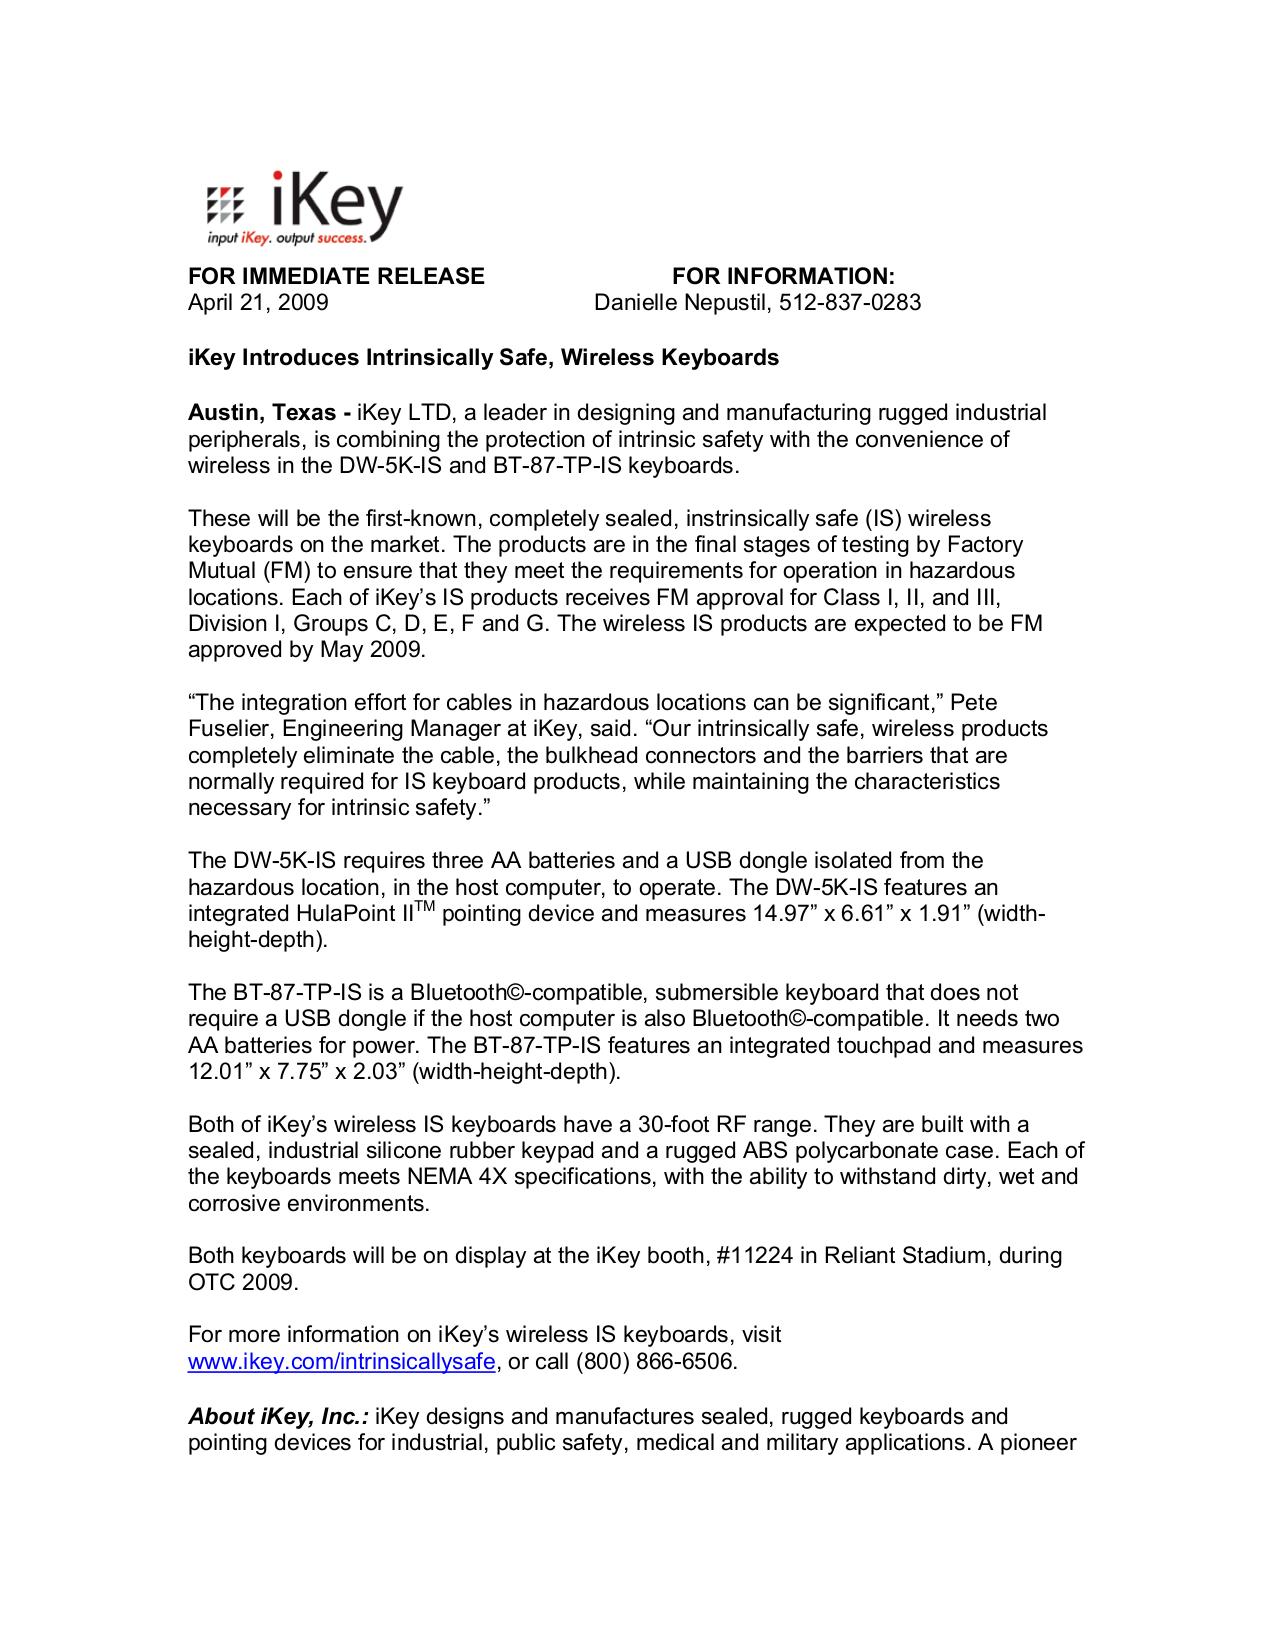 pdf for iKey Keyboard BT-87-TP manual